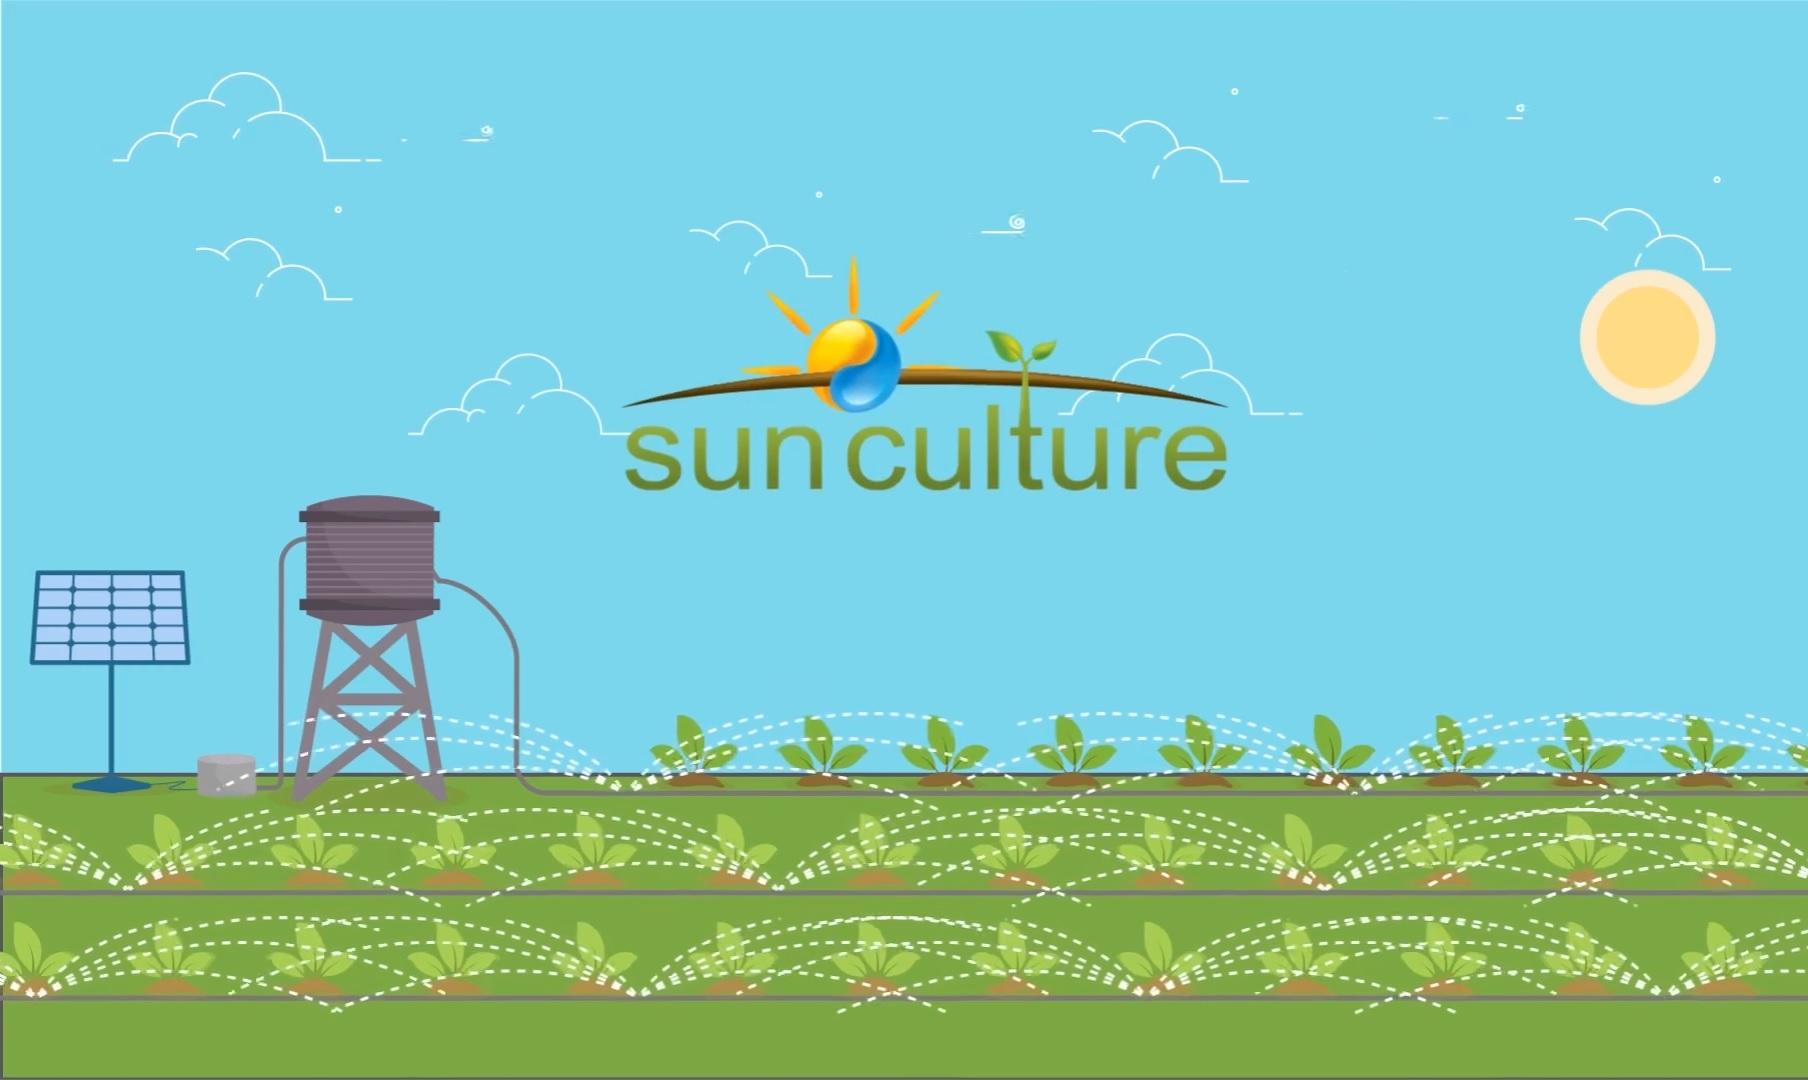 Sunculture - irrigation as a service